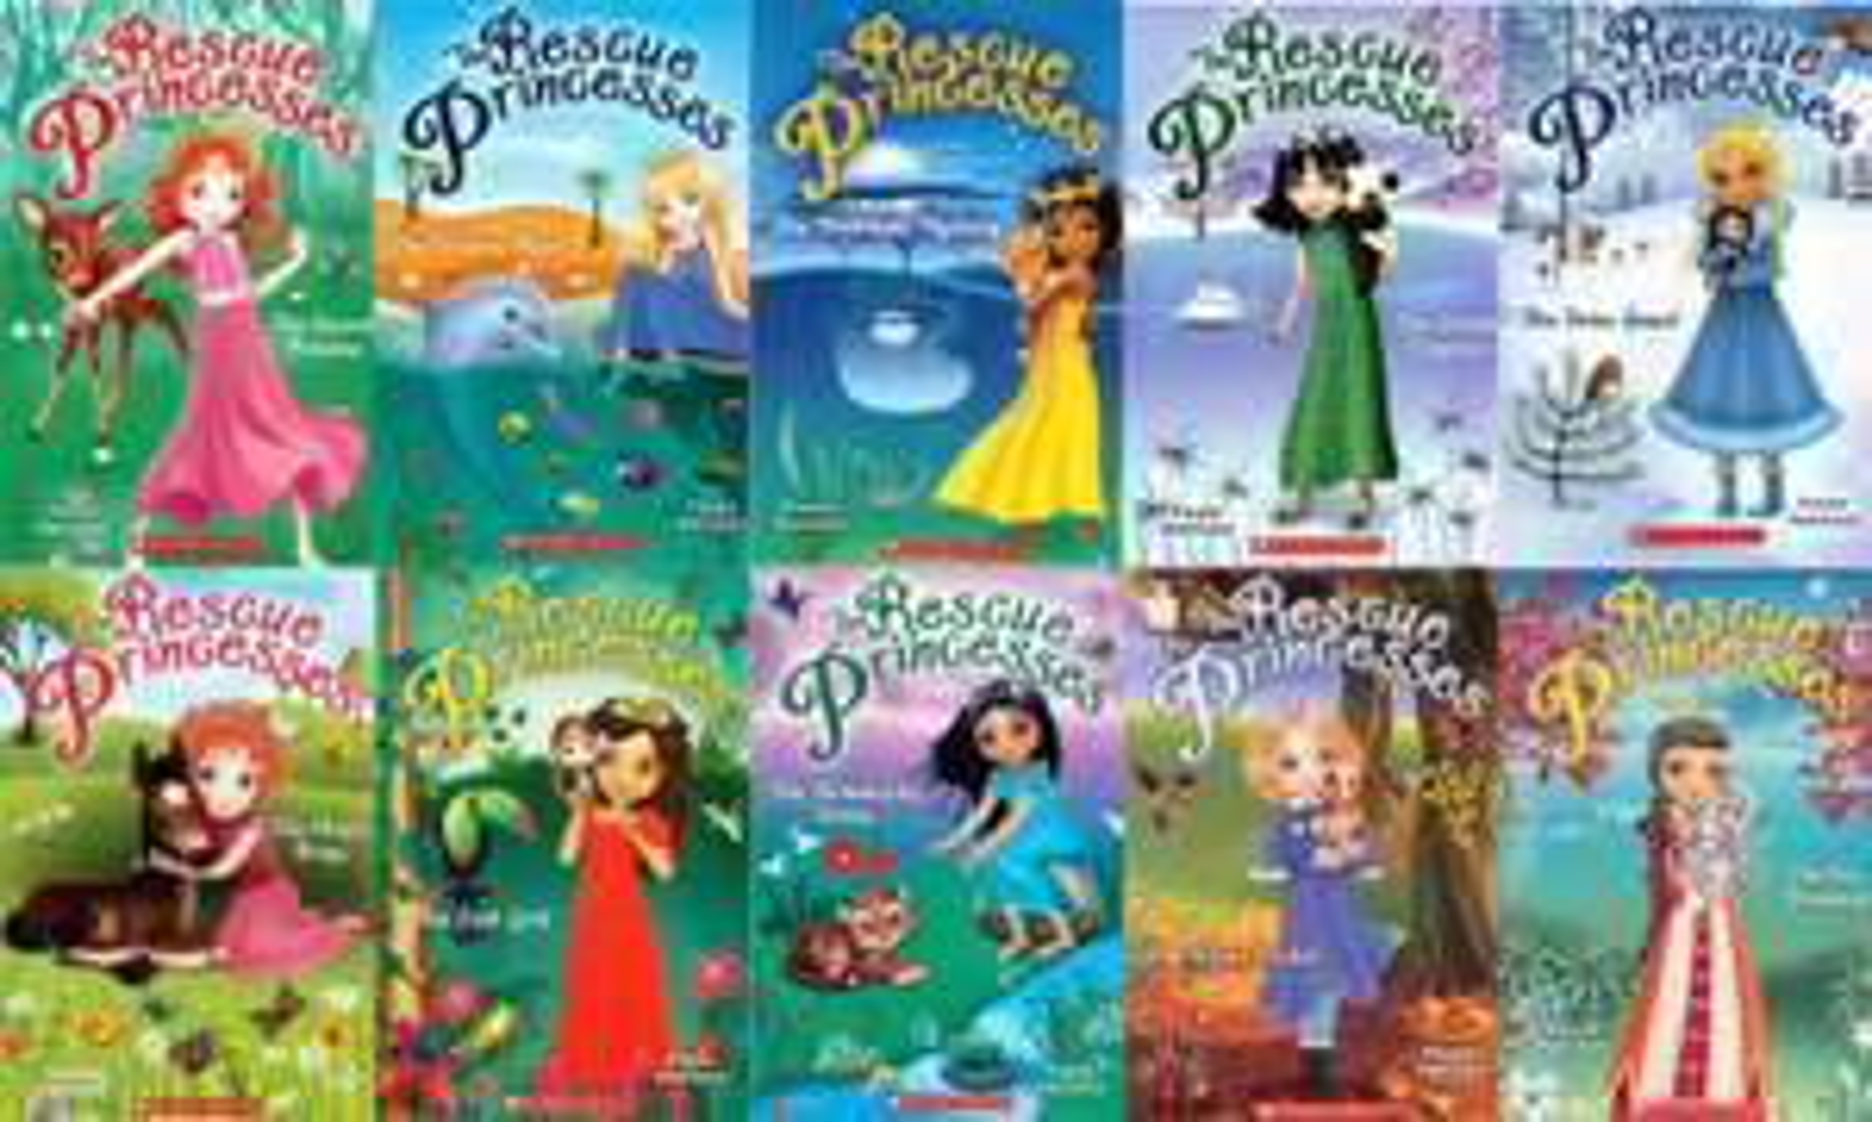 The Rescue Princesses 10 Books Set £9.99 Paperback By Paula Harrison @ TK Maxx (£1.99 C&C)